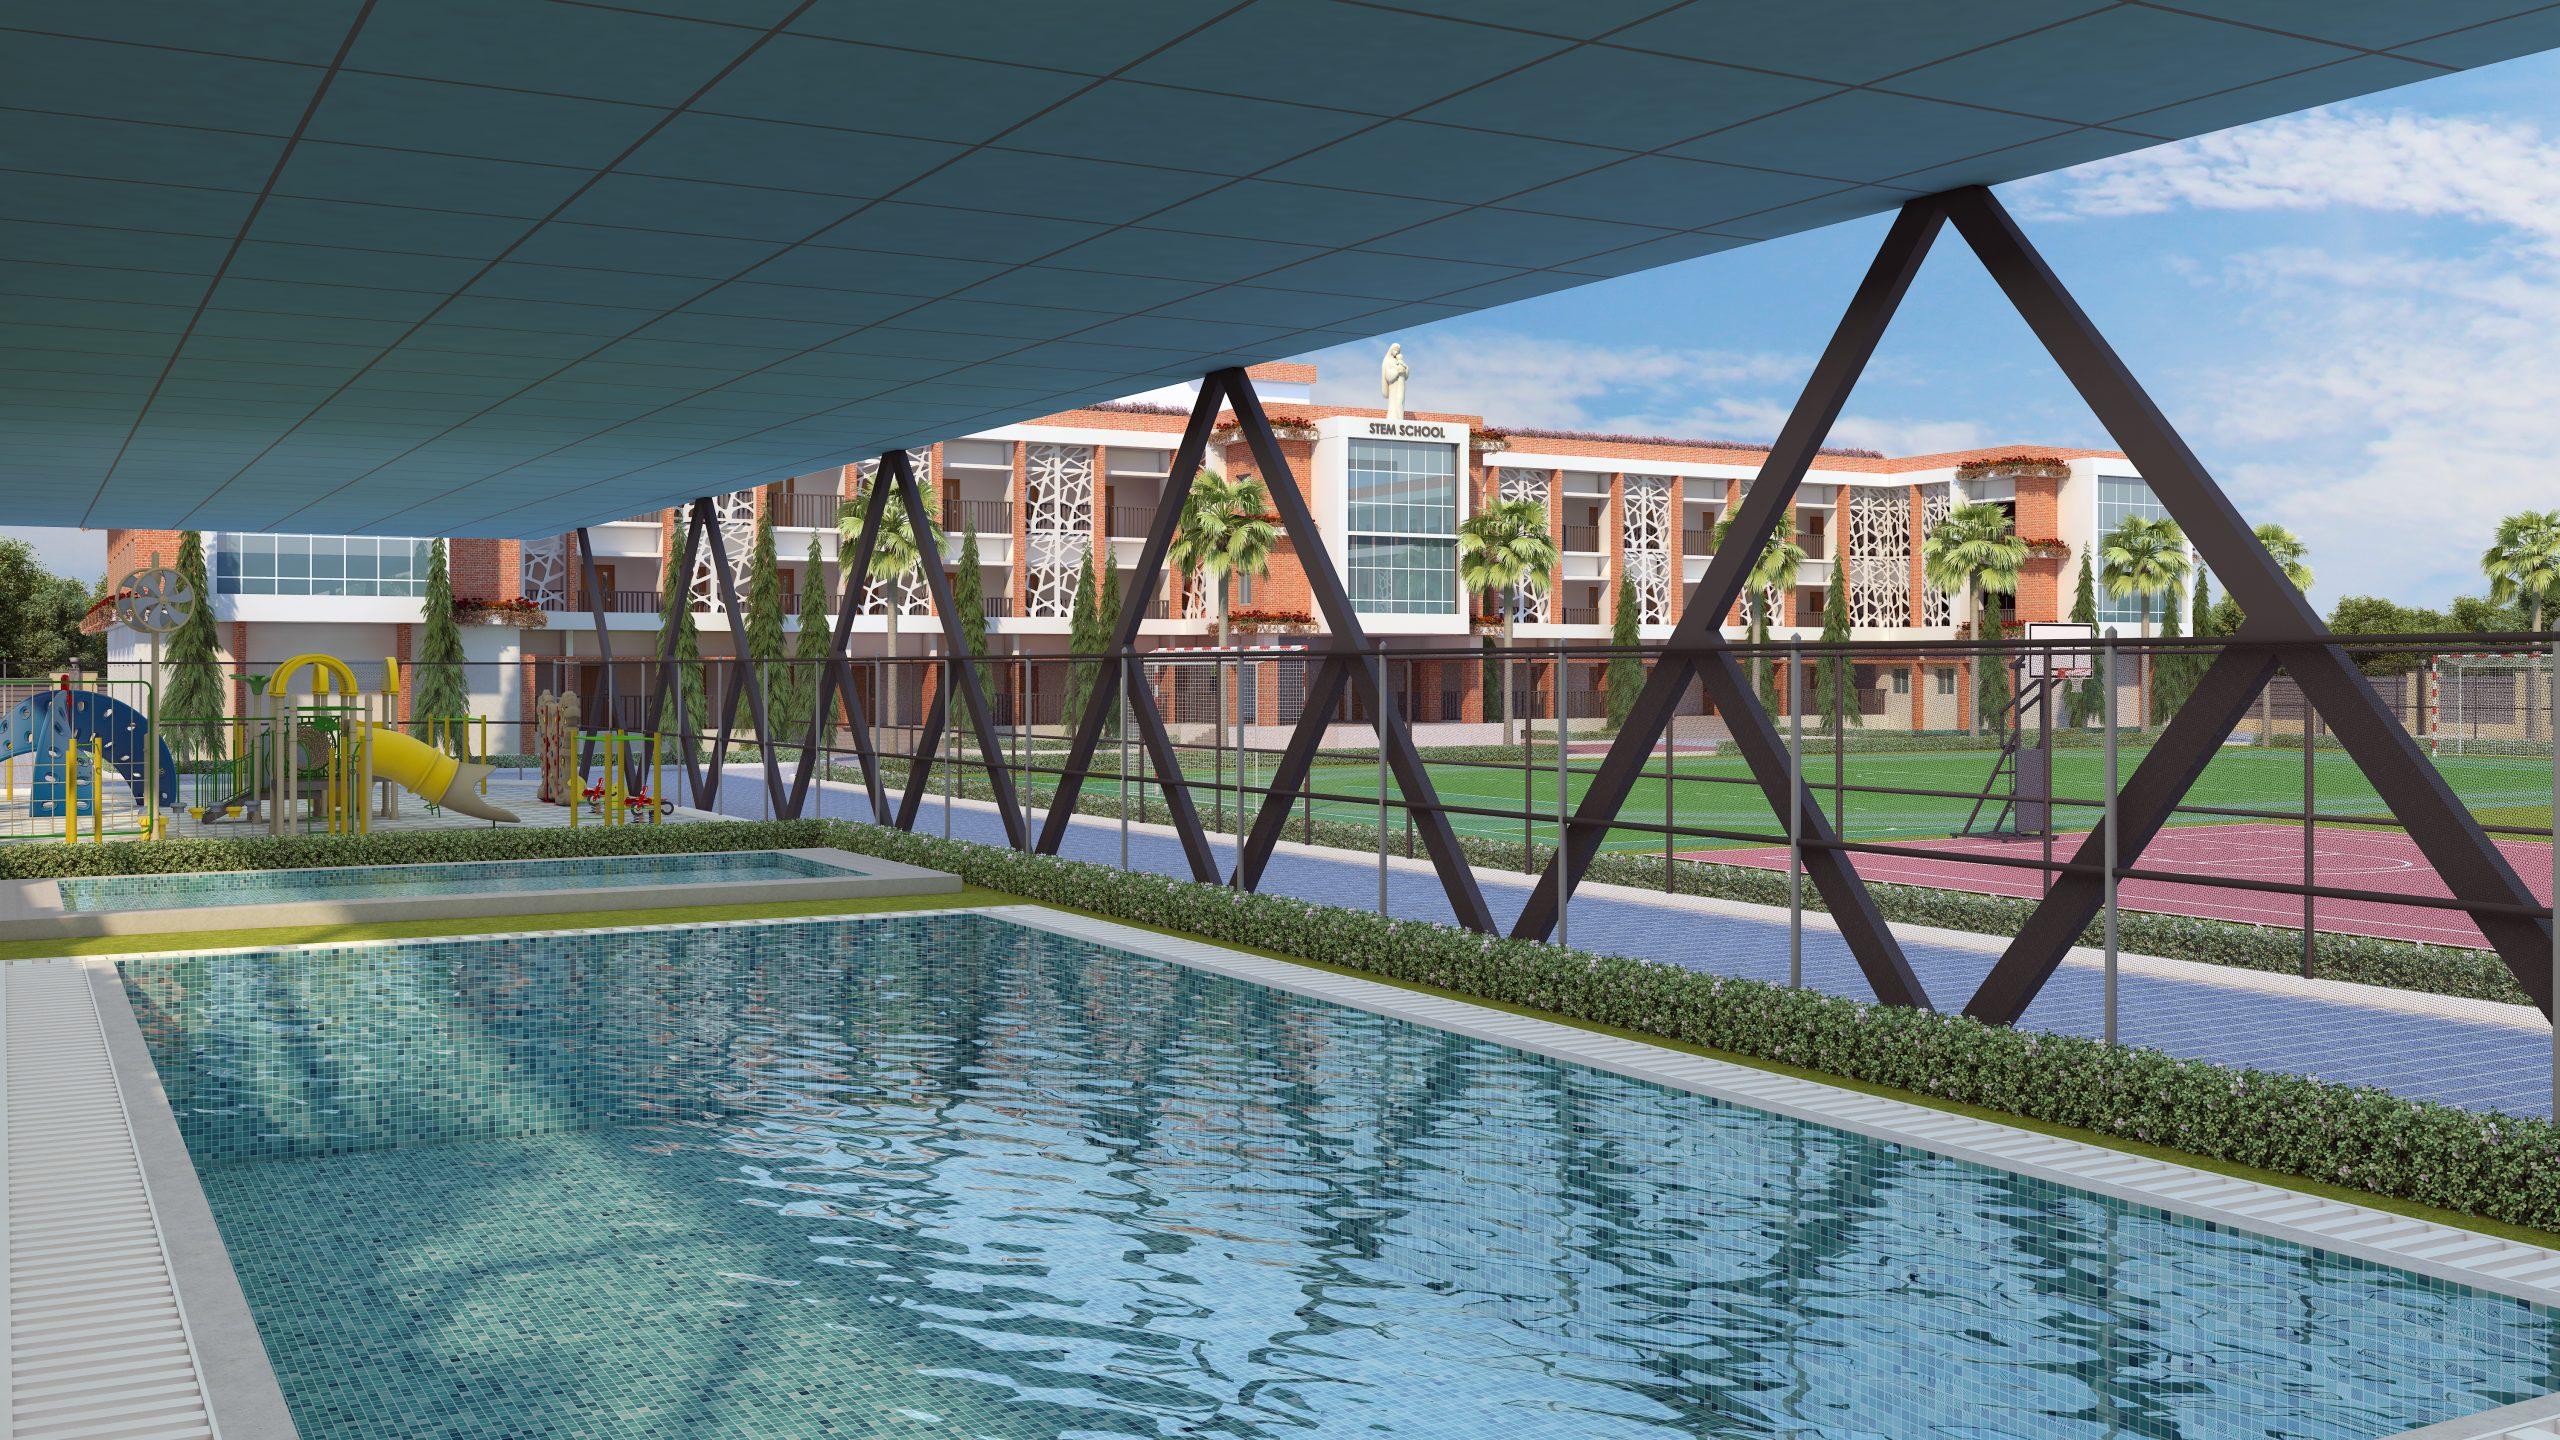 Top school Architects for CBSE schools in India, Best School Building Architects in India,Best School Designs in India,School Architecture firm